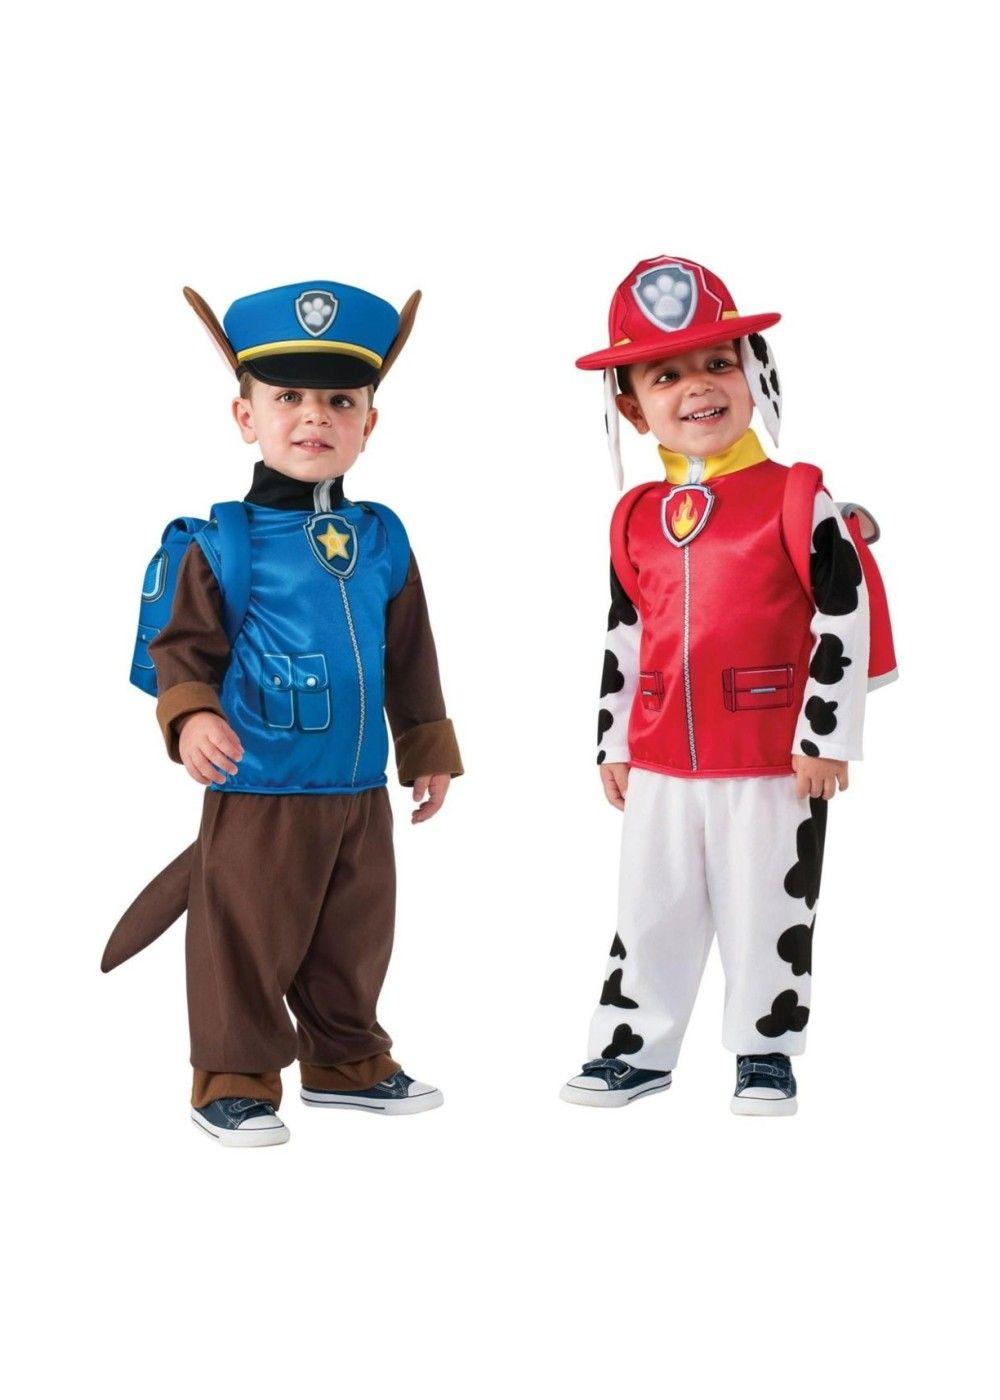 Paw Patrol Rubble Child Fancy Dress Costume Kids Cartoon Dog TV Outfit